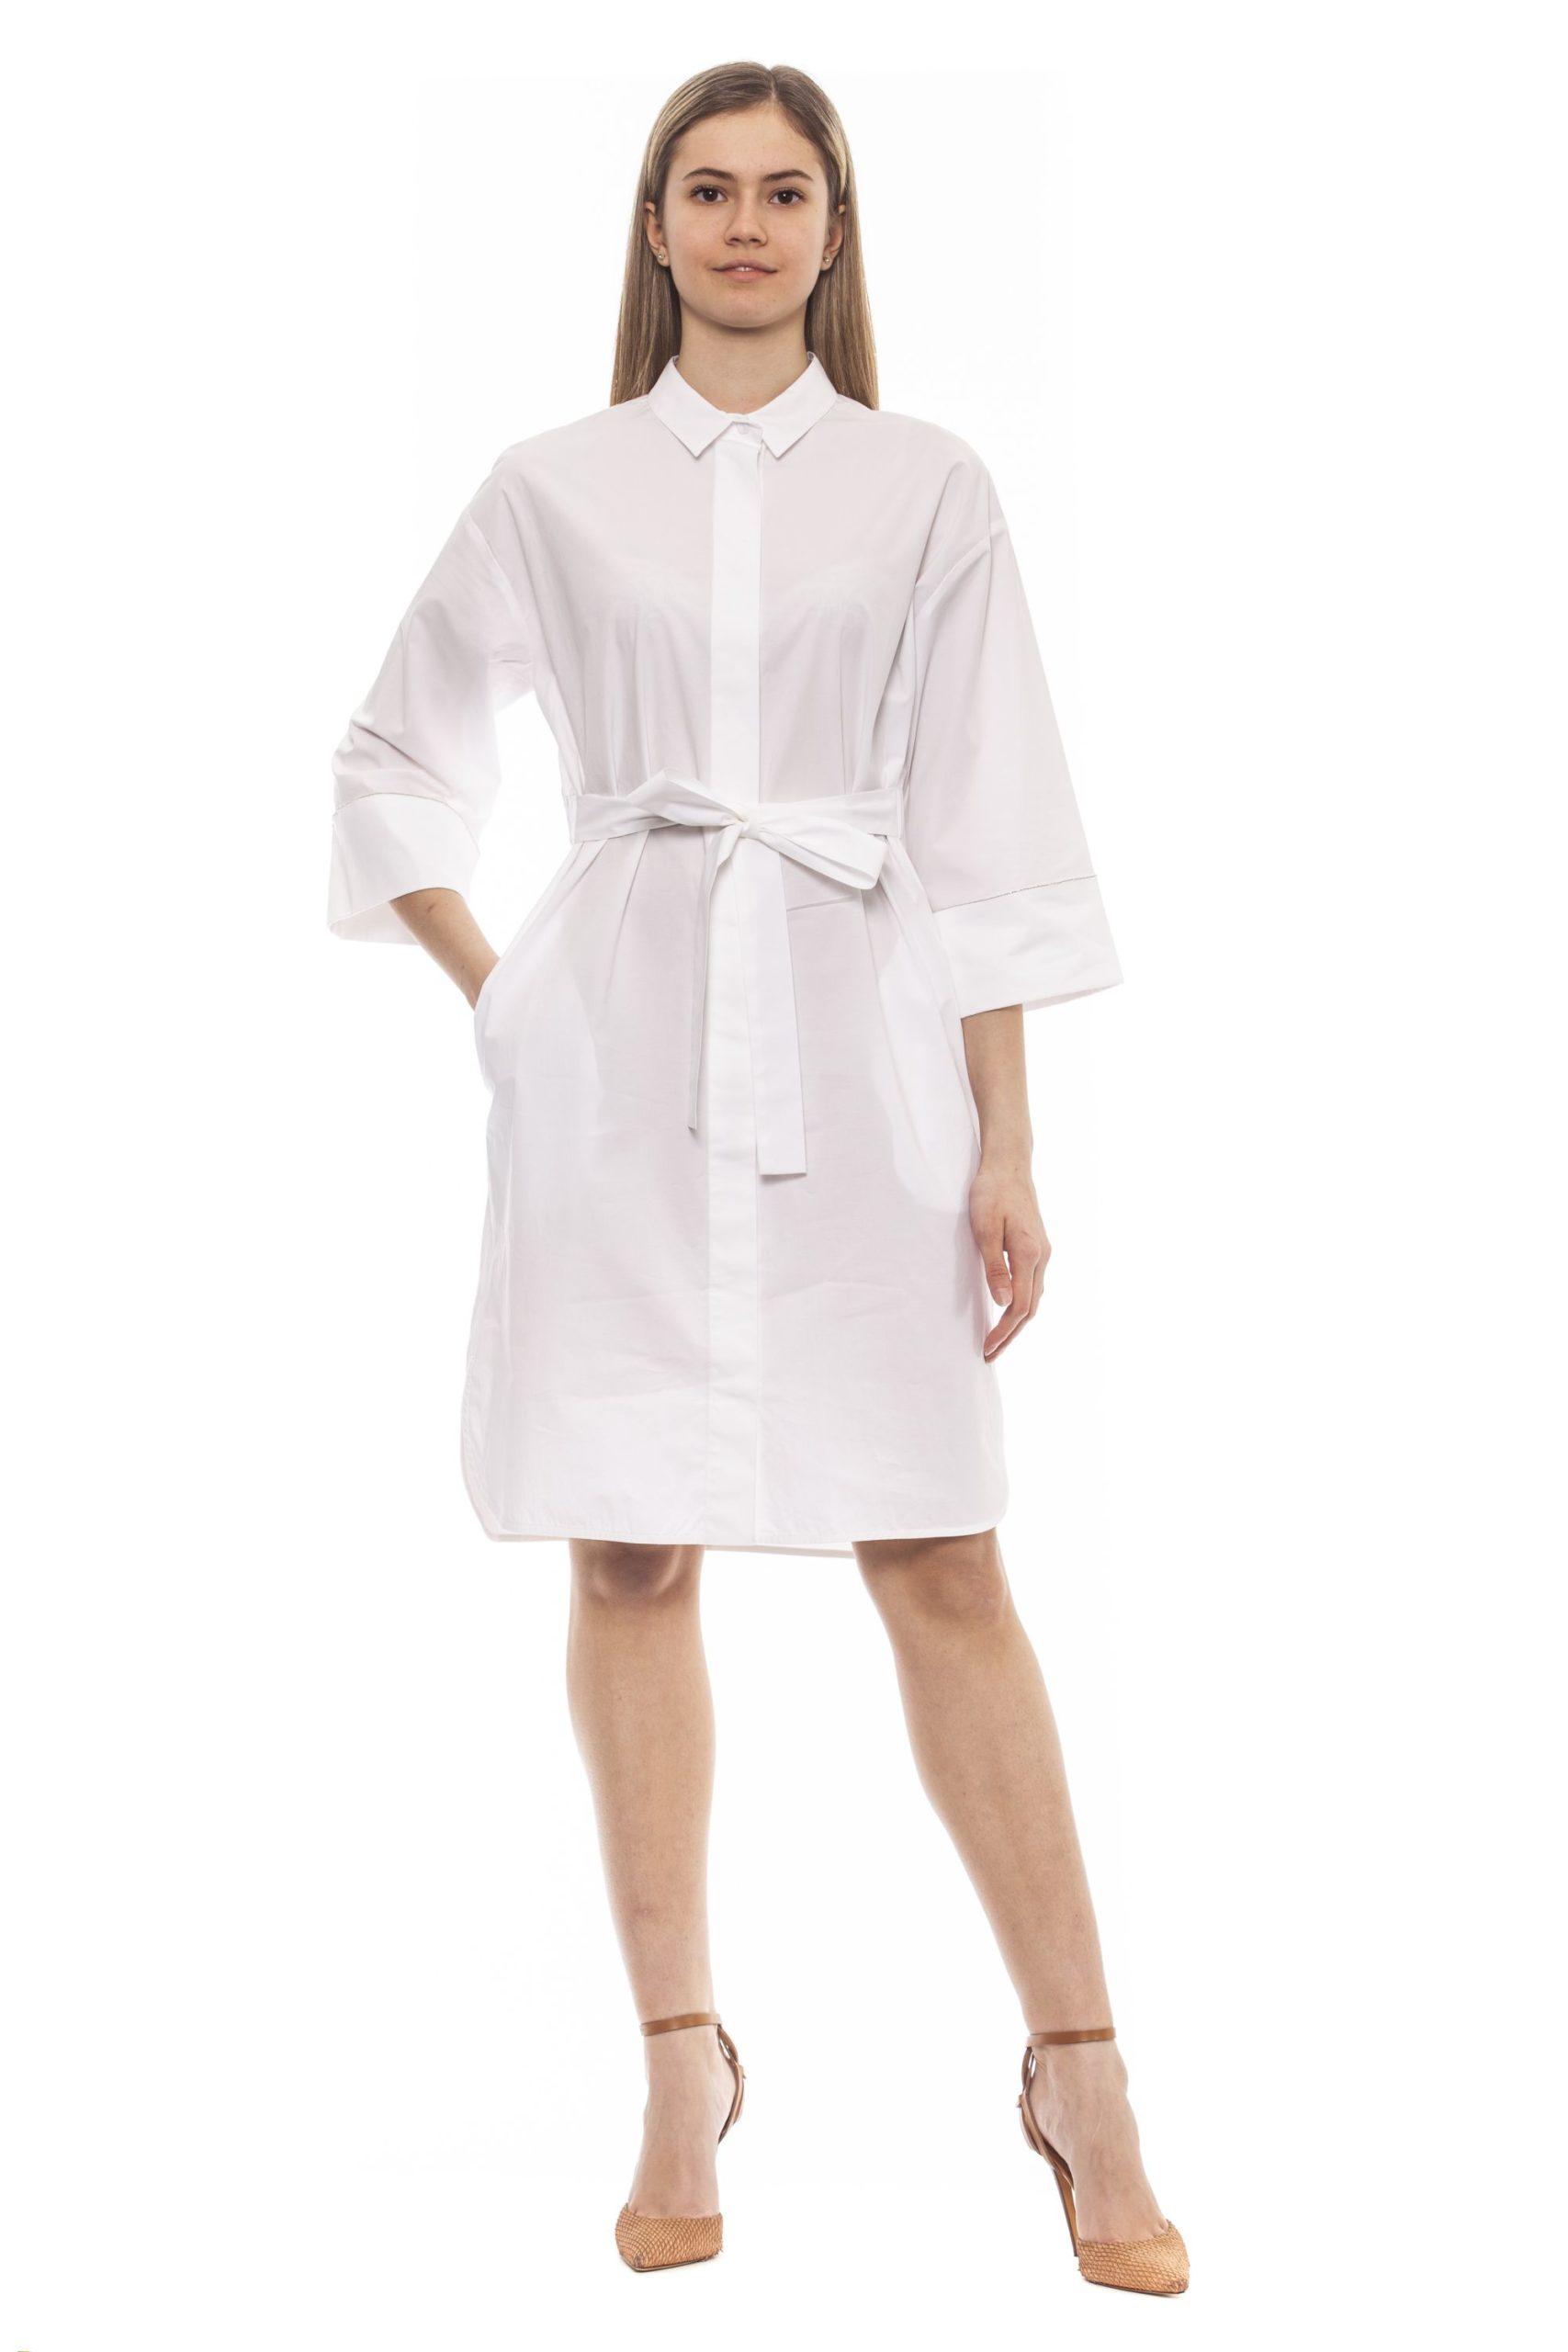 Peserico Women's Bianco Dress White PE1383280 - IT42   S